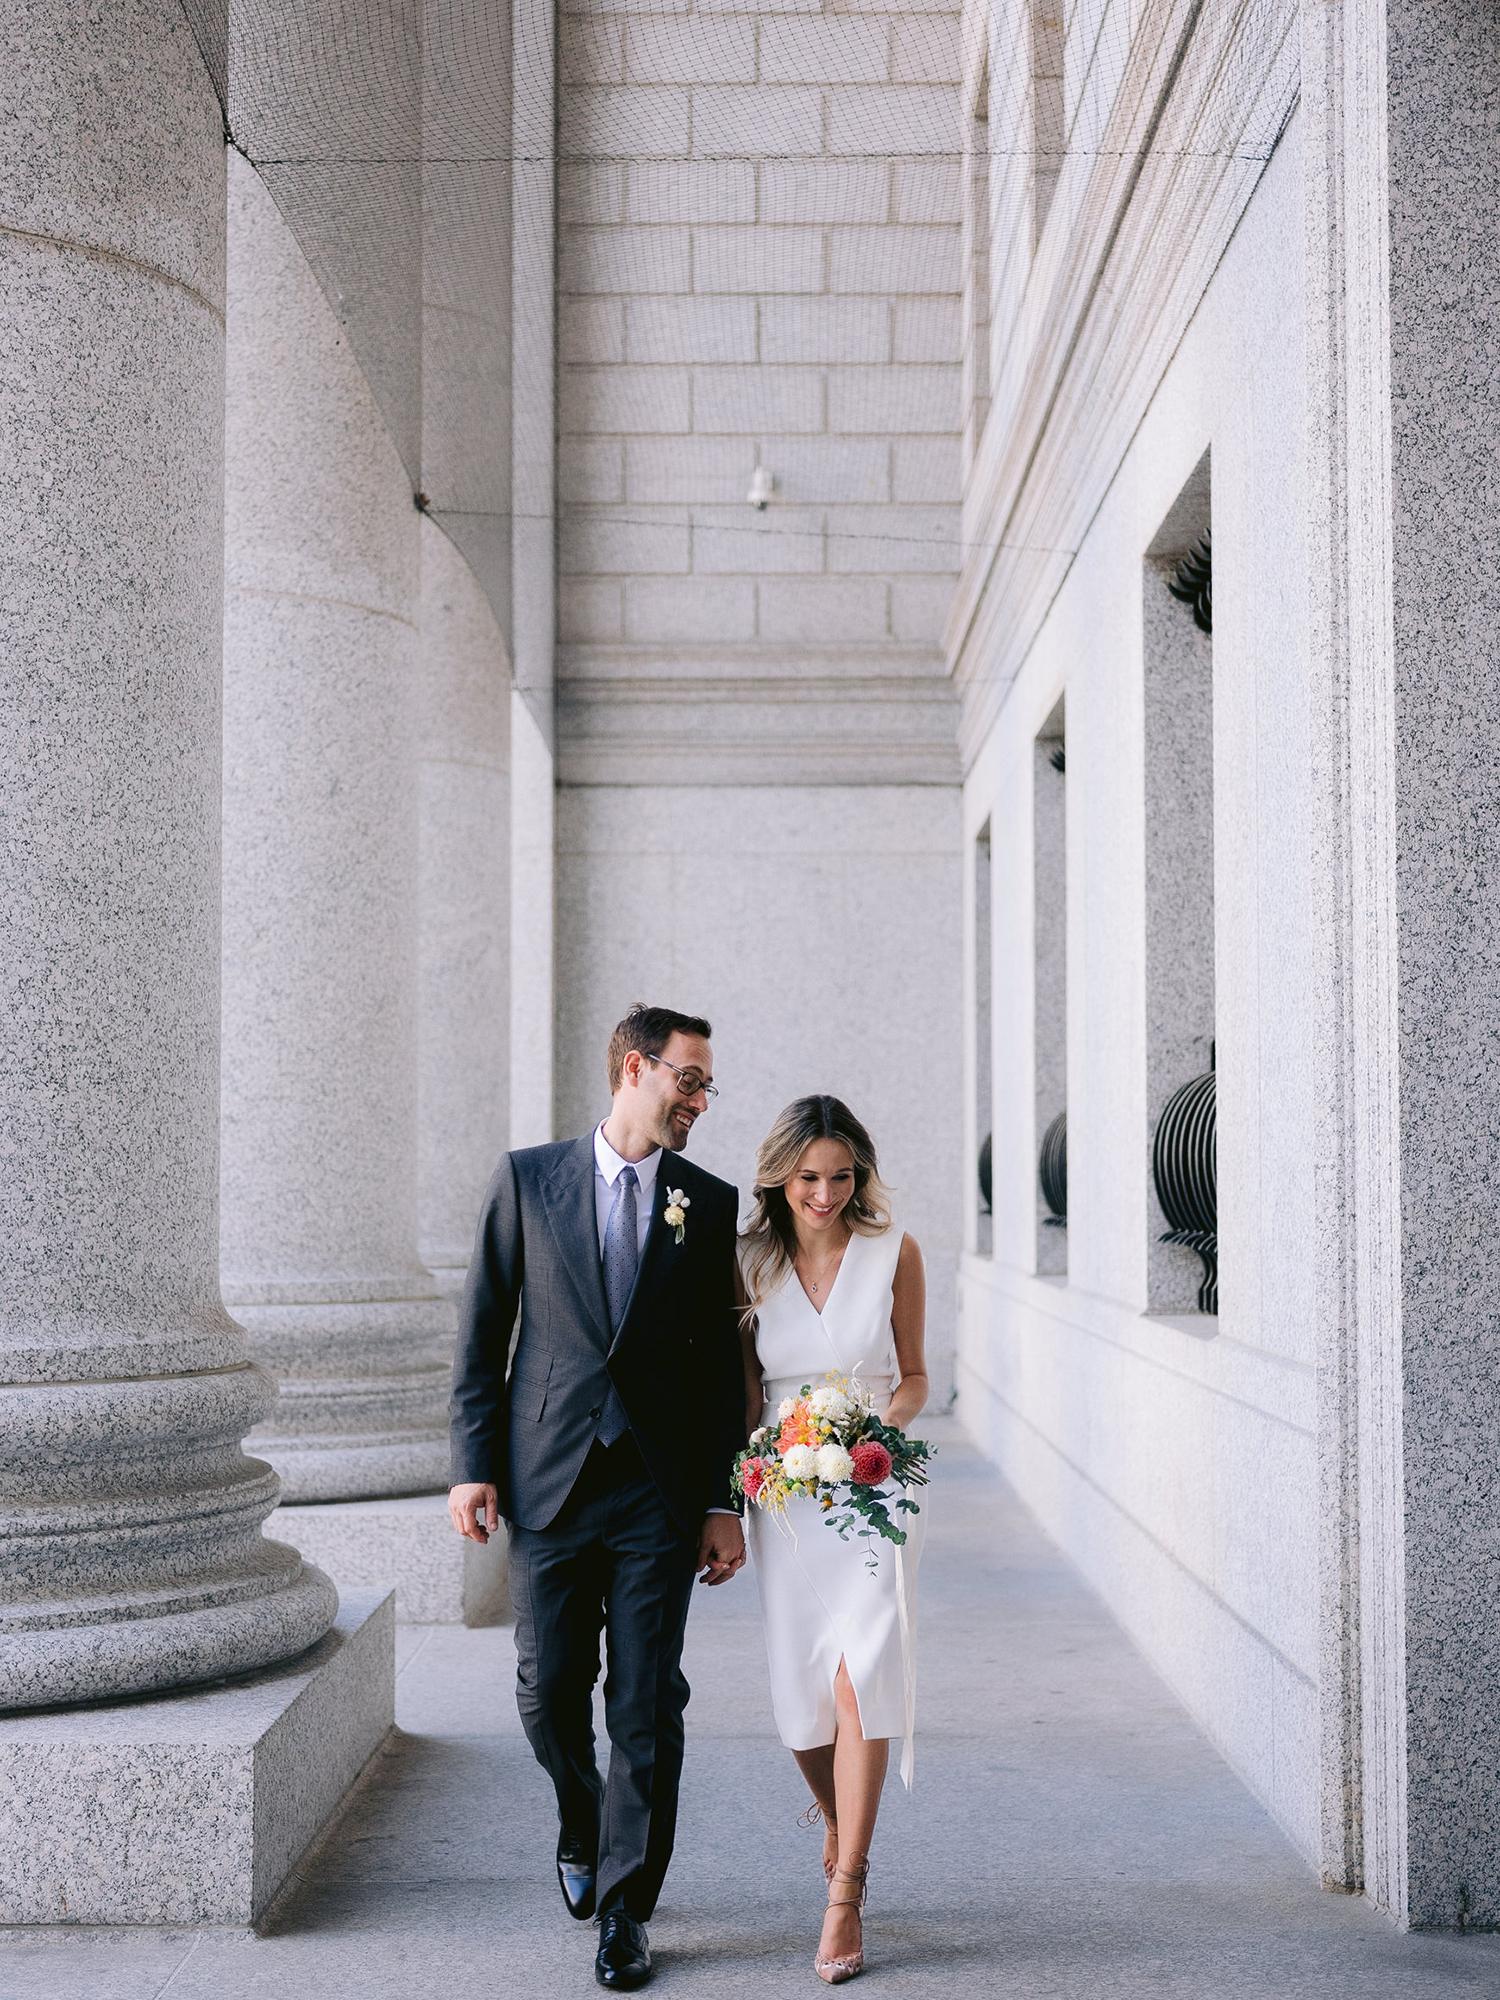 City-Hall-Elopement-New-York-Wedding-Photographer-033